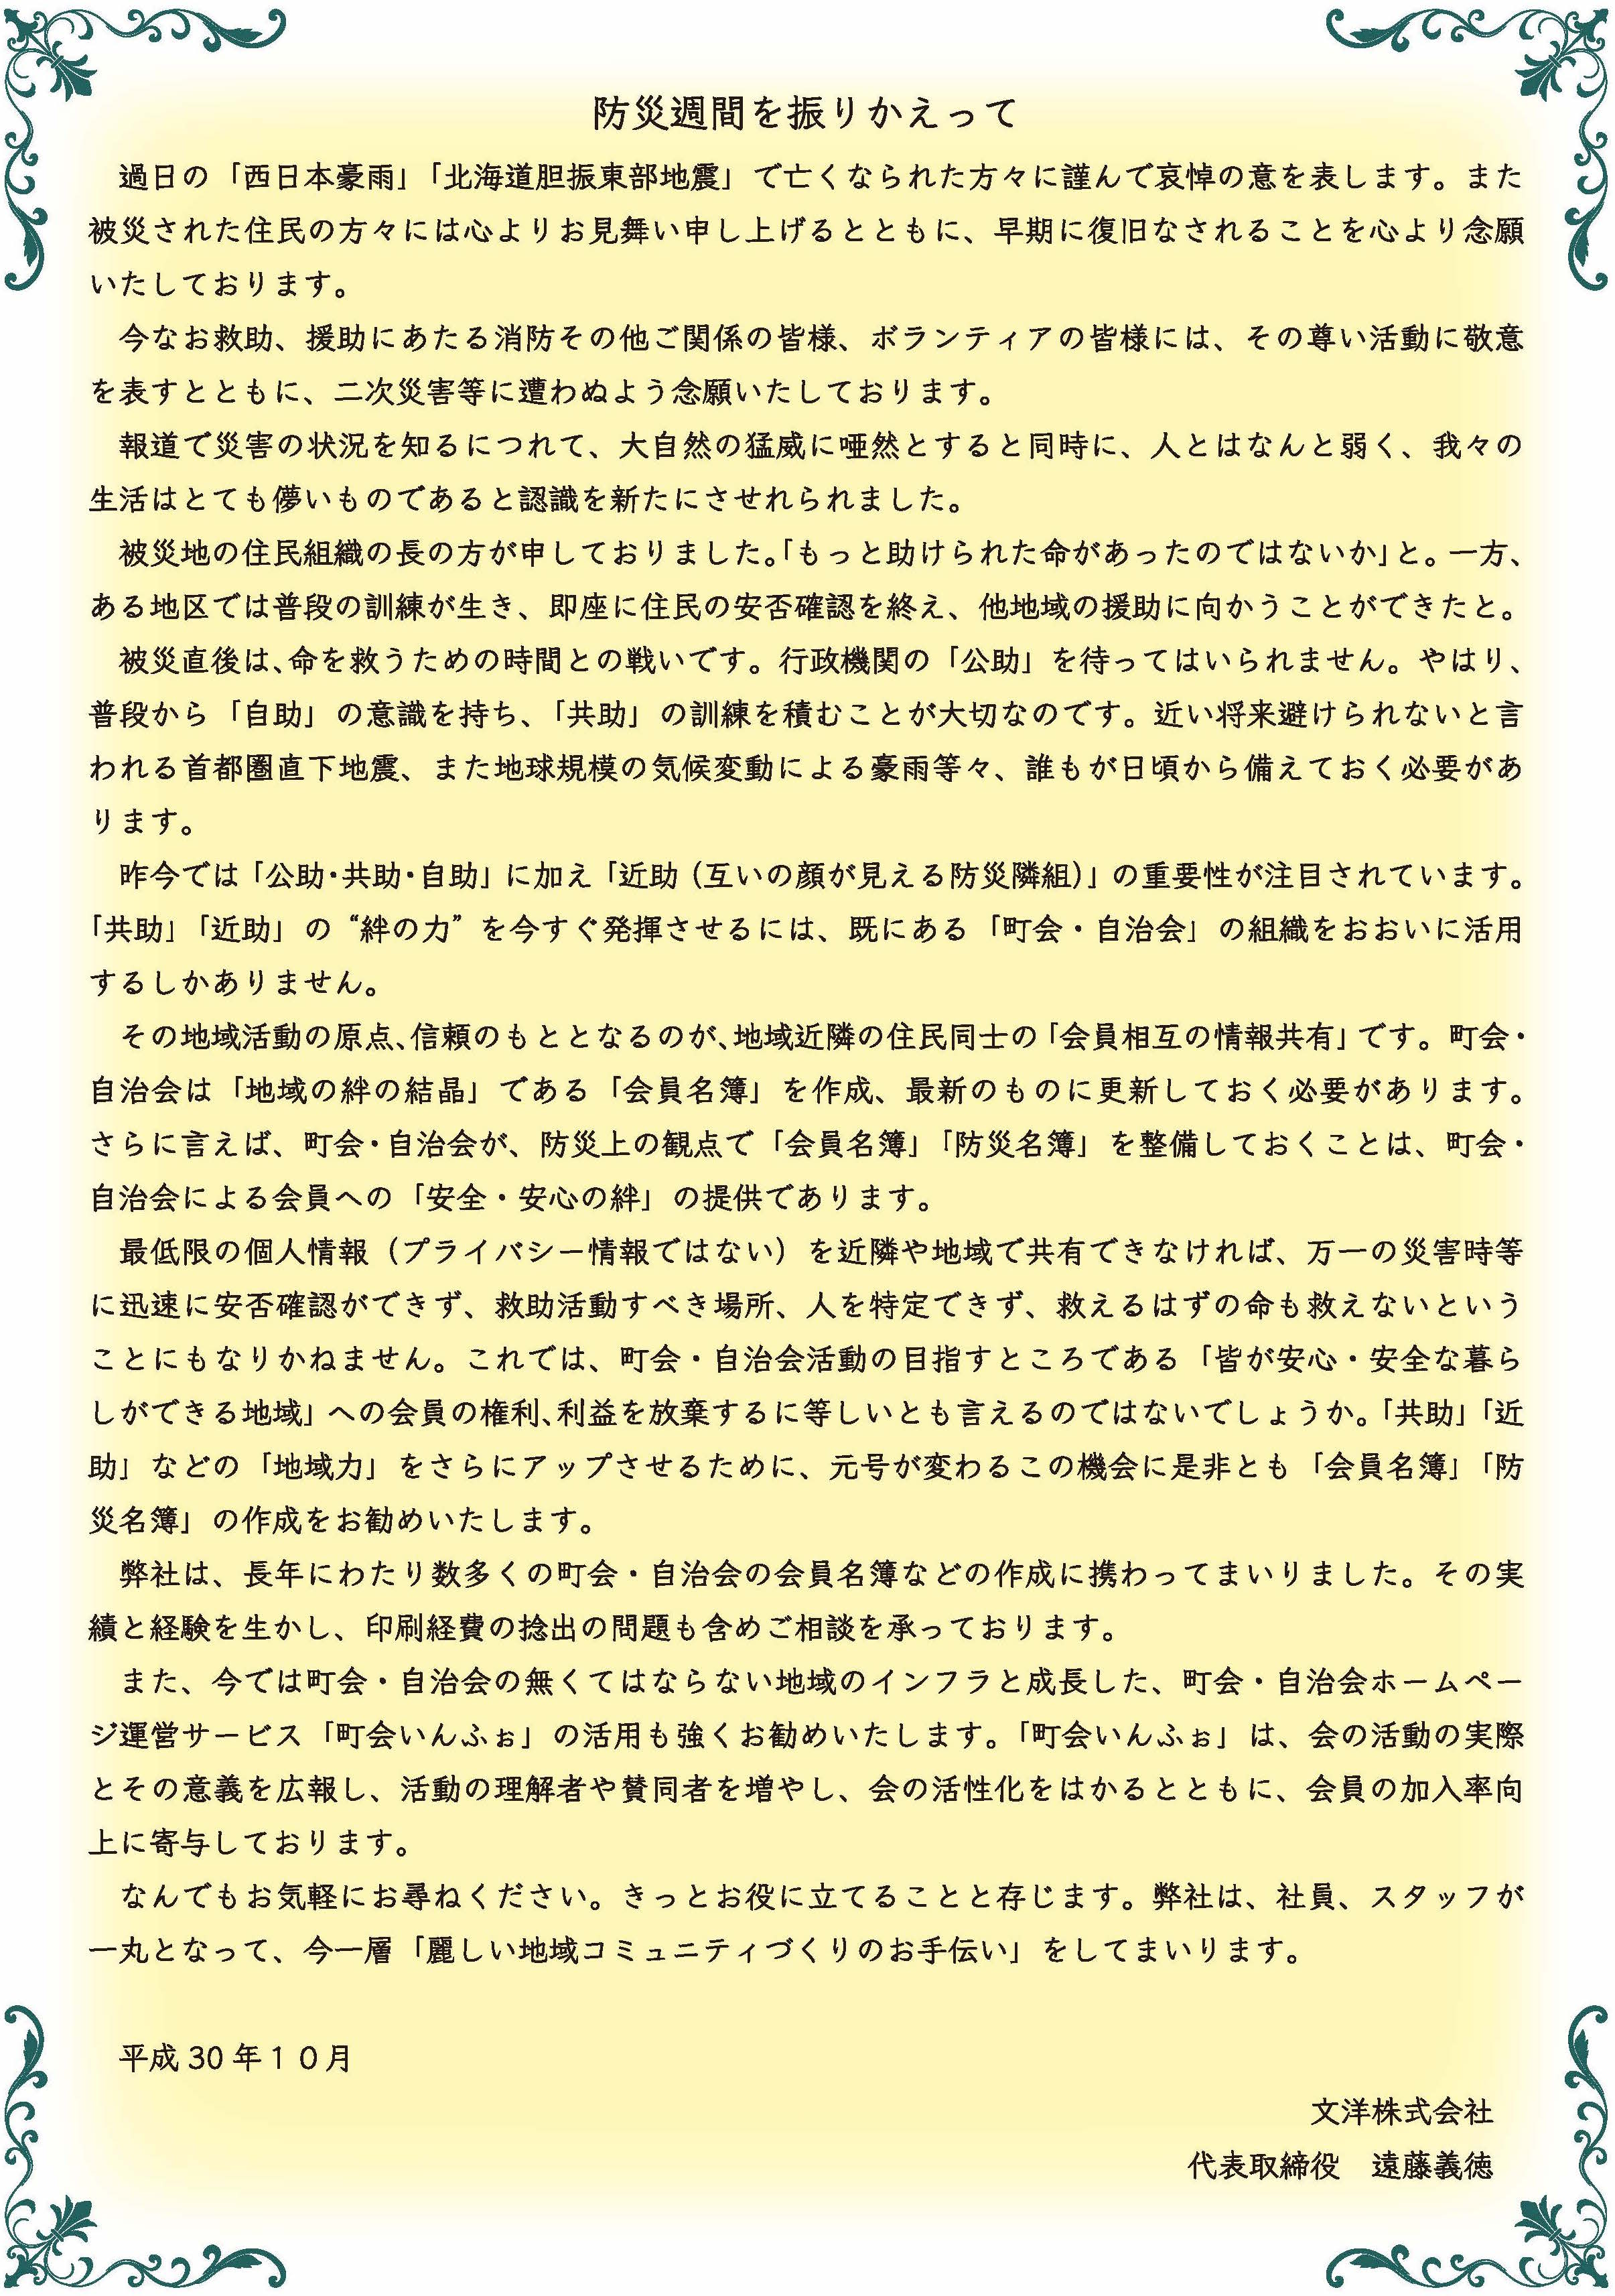 181001bosai_furikaette2.jpg